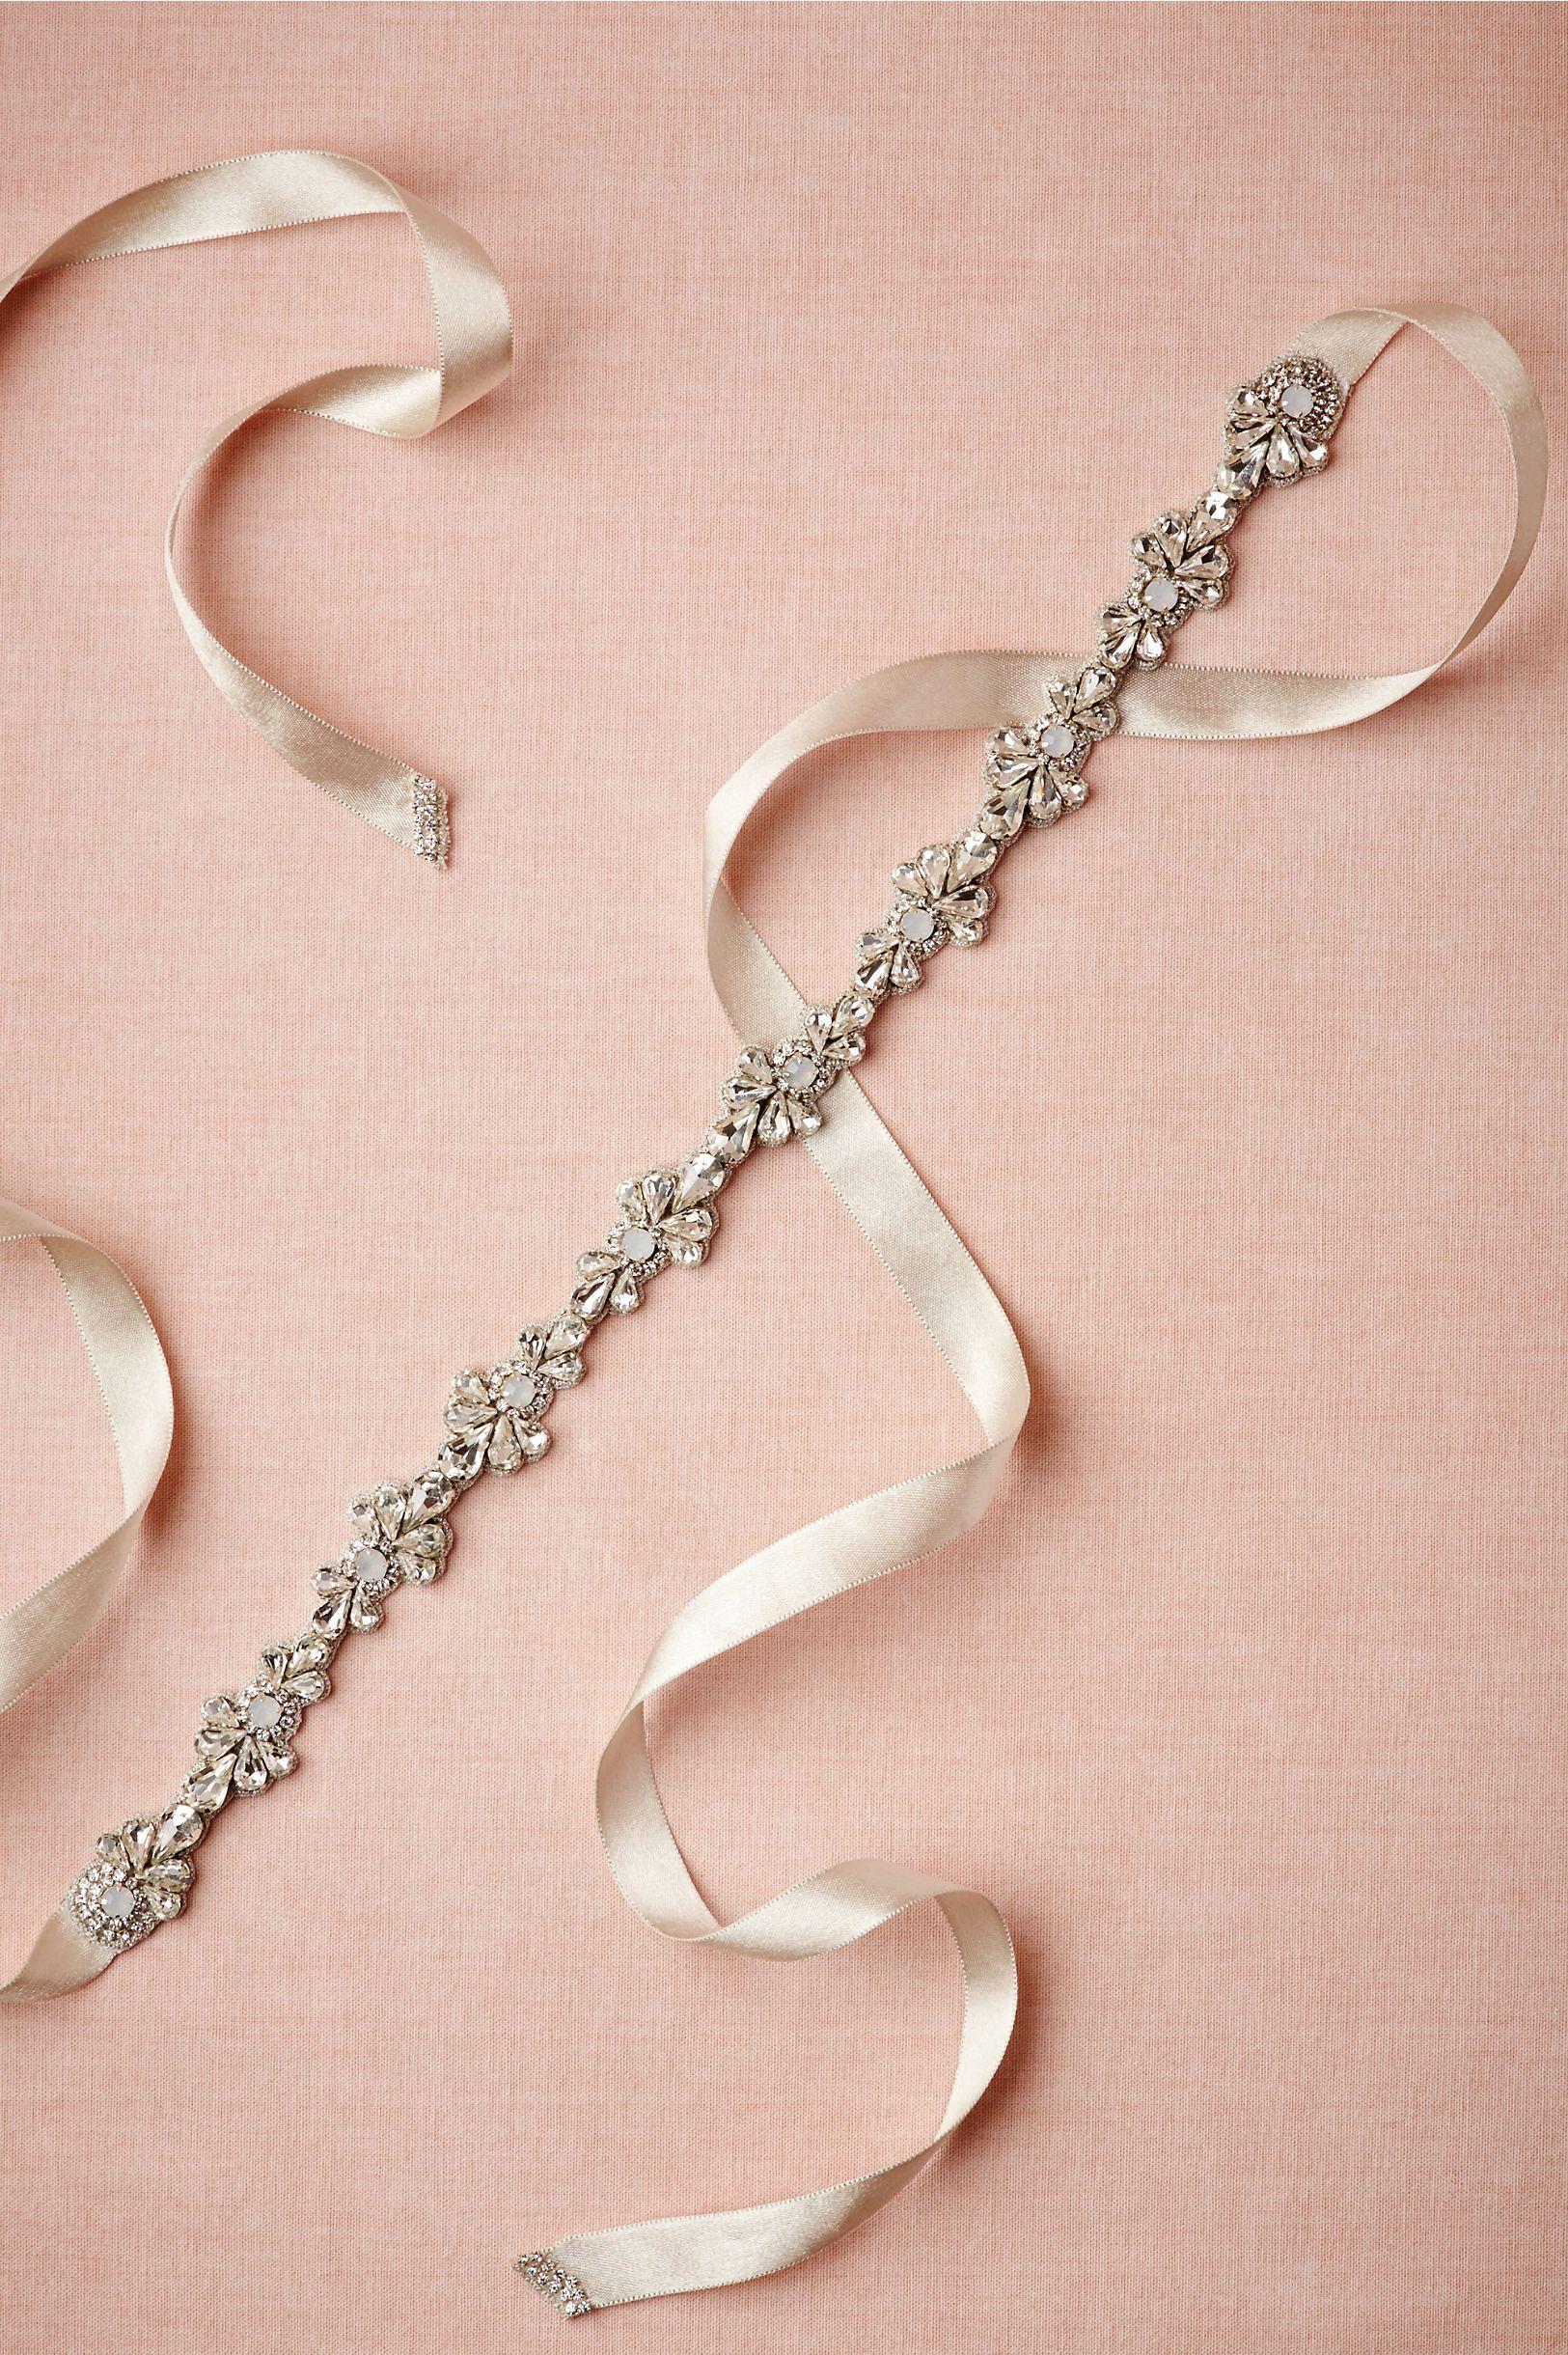 Opaline & Pearl Sash in Sale Accessories at BHLDN